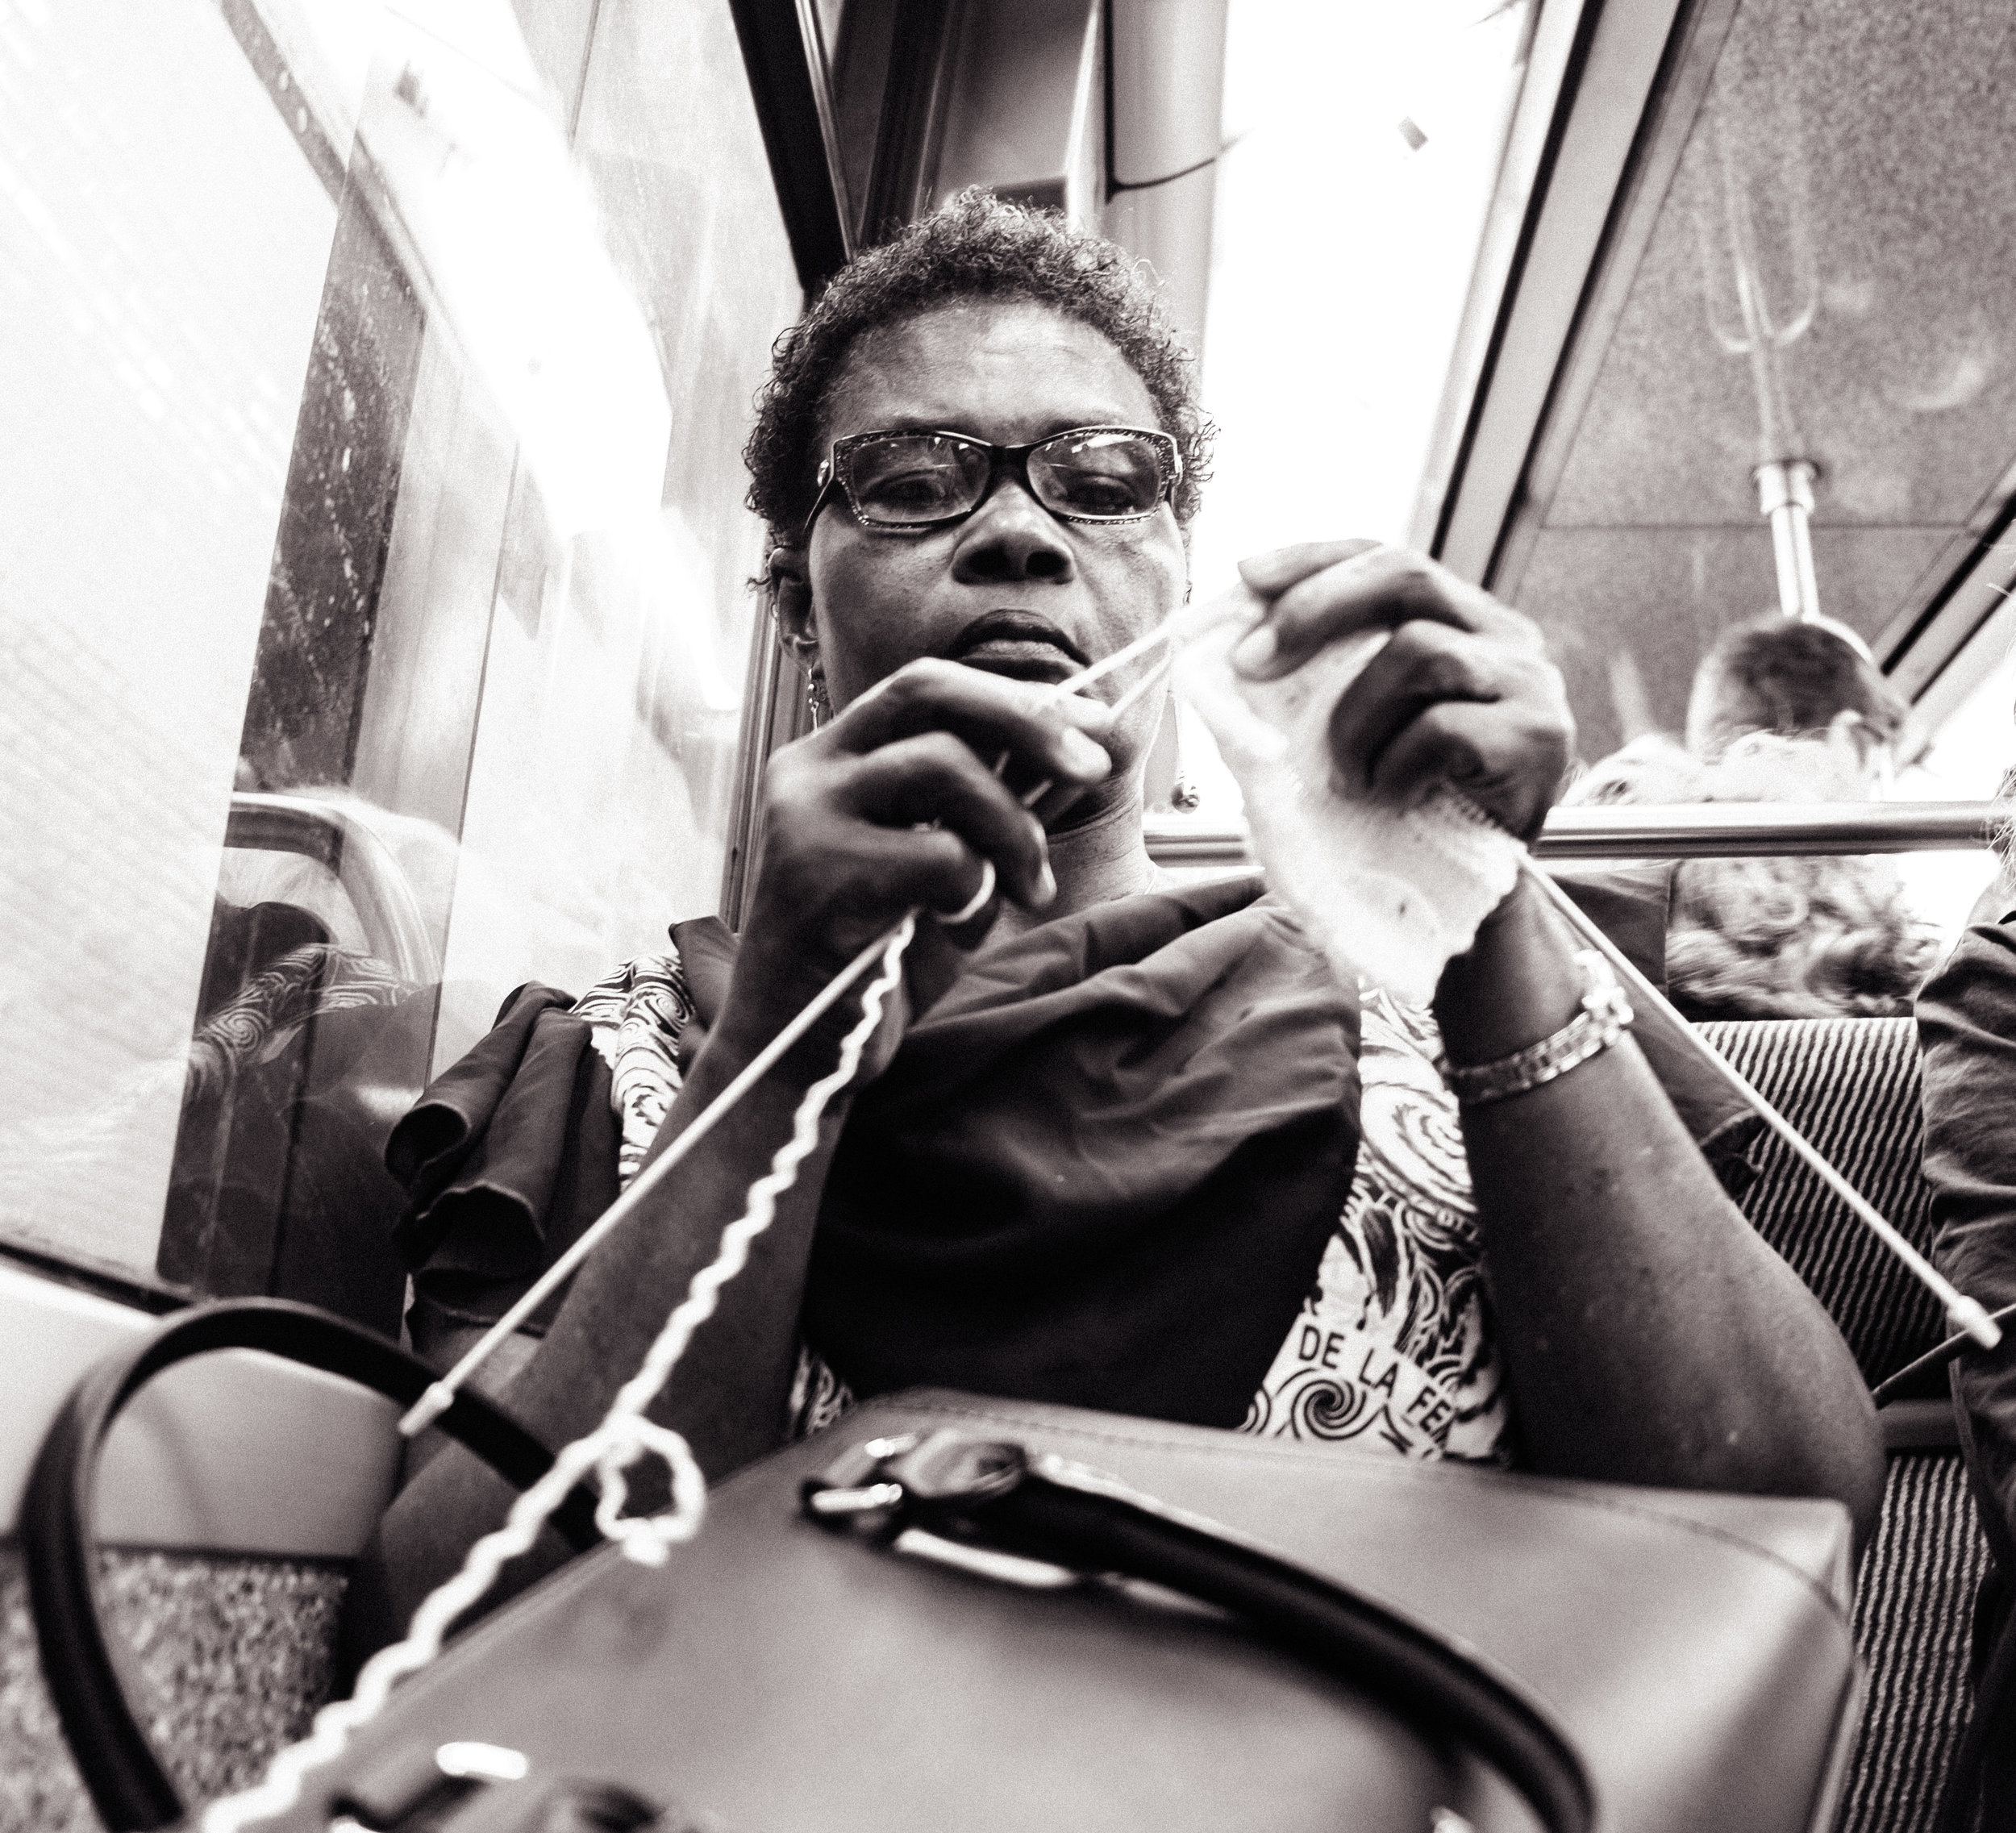 Knitting woman in the subway, Paris